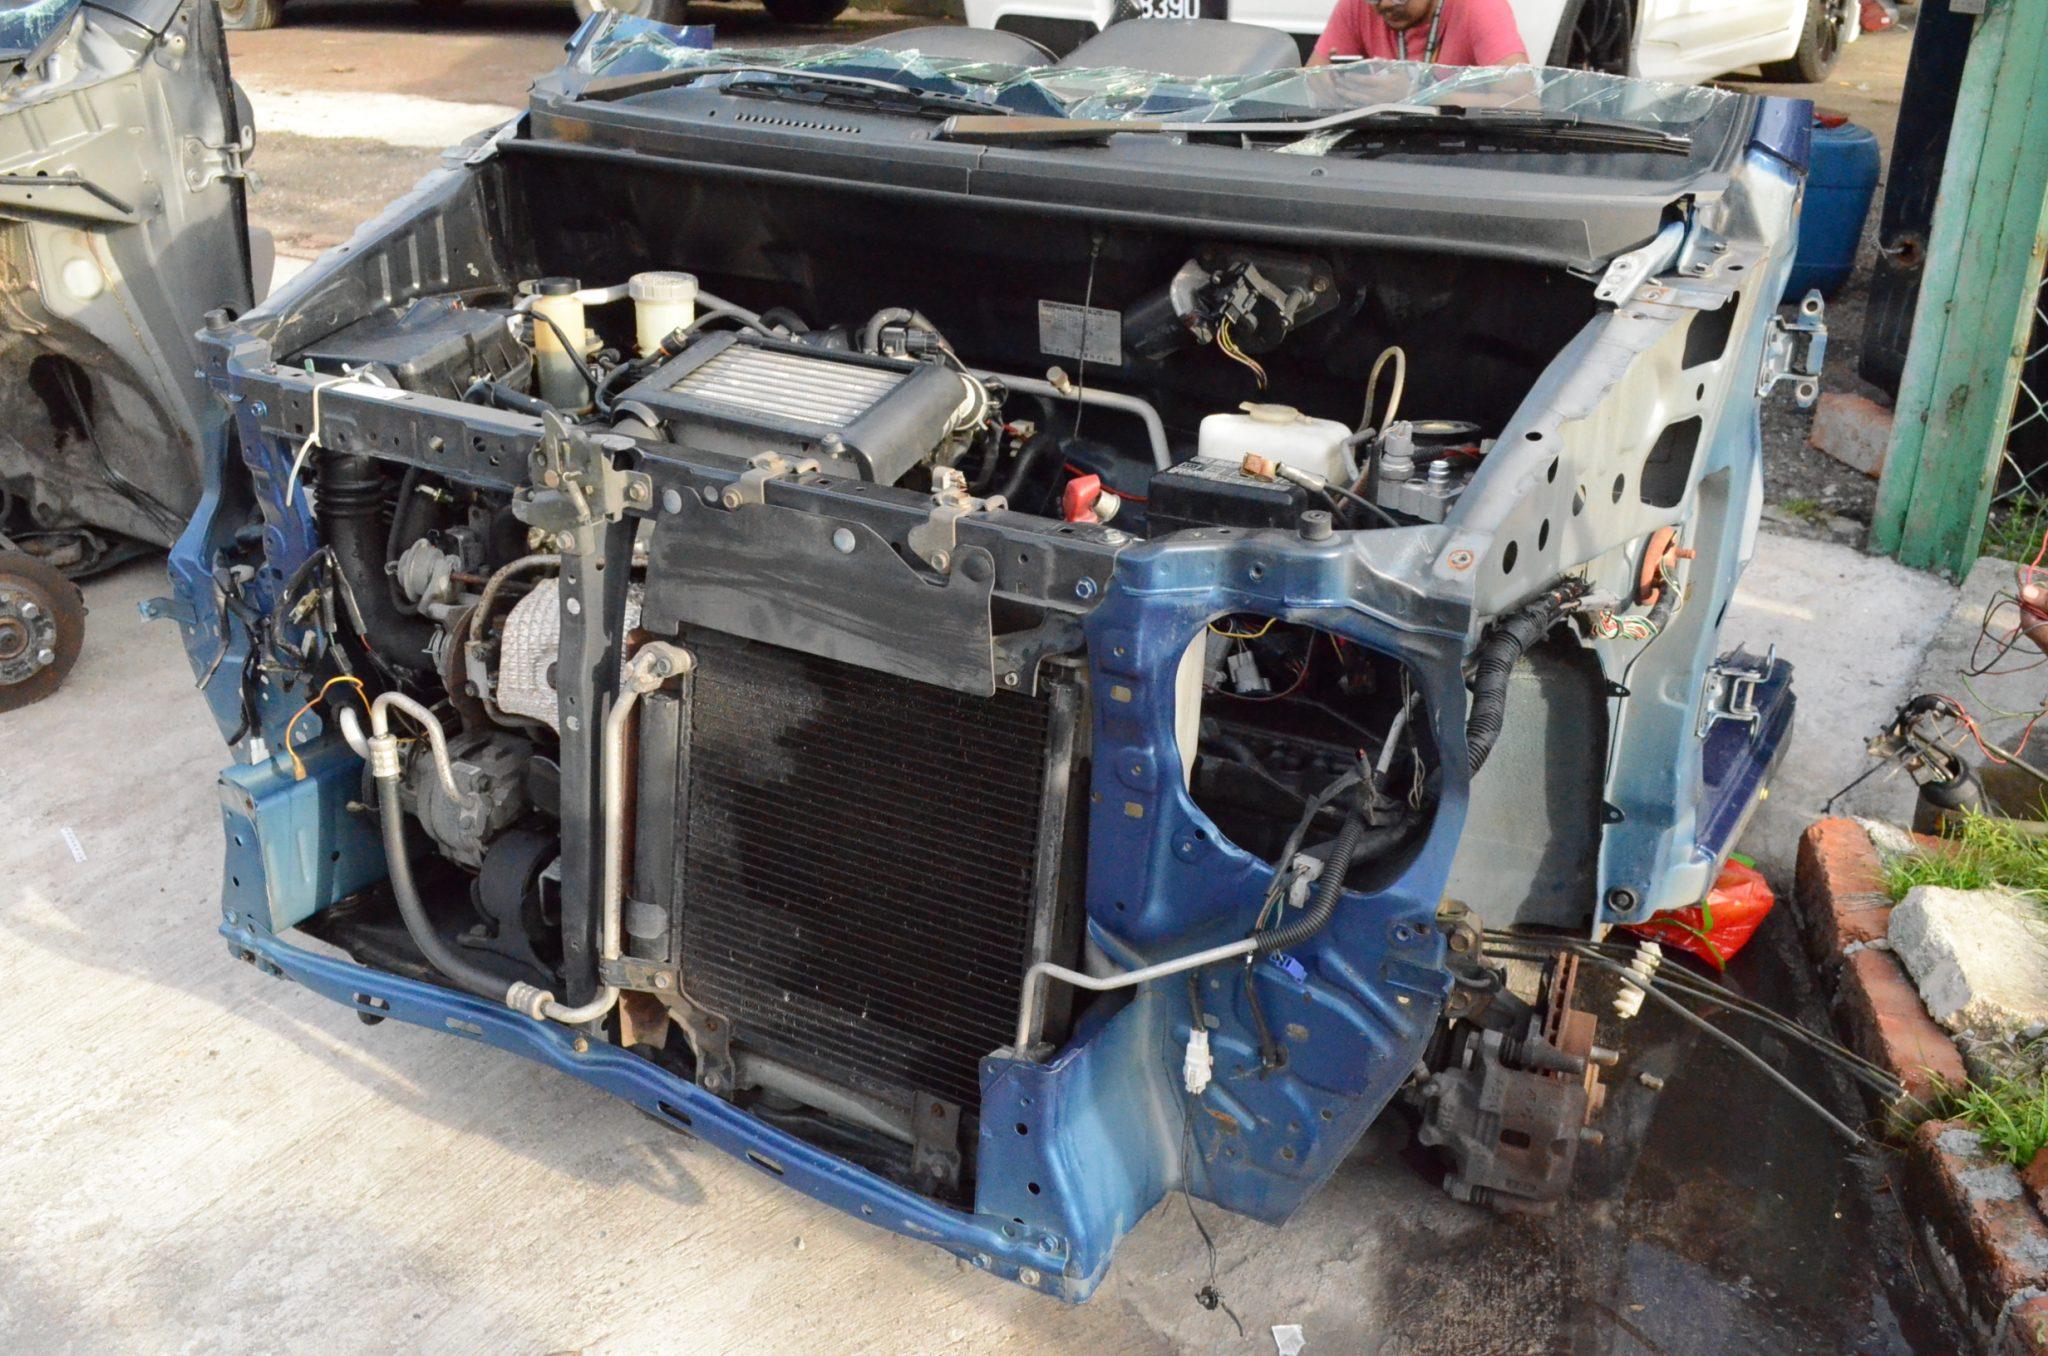 L9 move RS Halfcut triptronik 660 Turbo ef engine